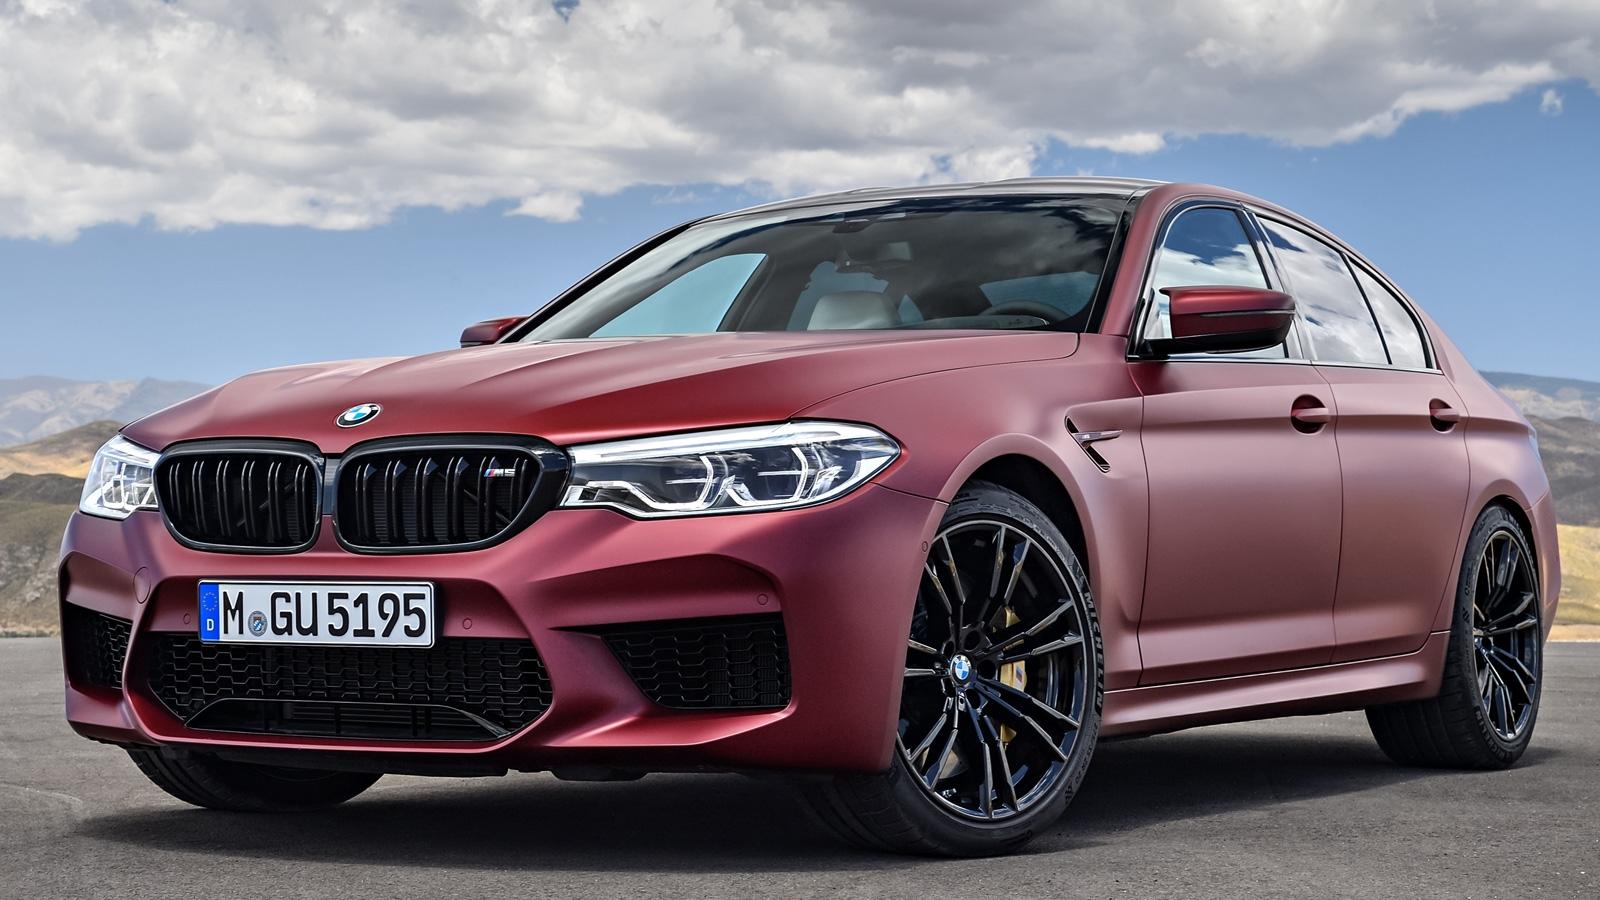 BMW M5 F90 Remus